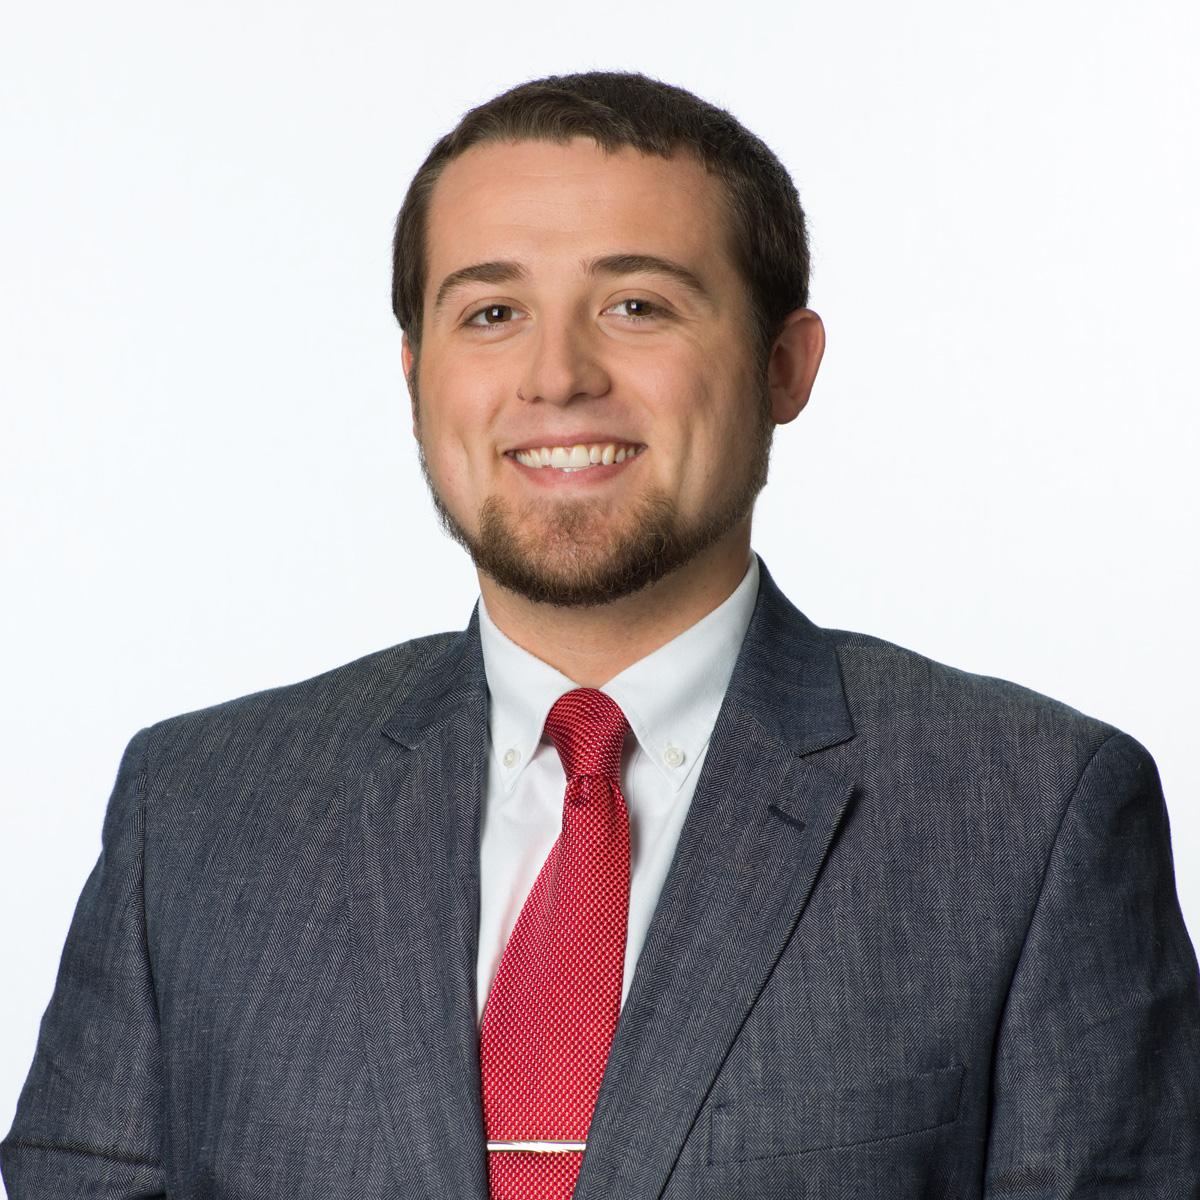 Tyler Stokesbary